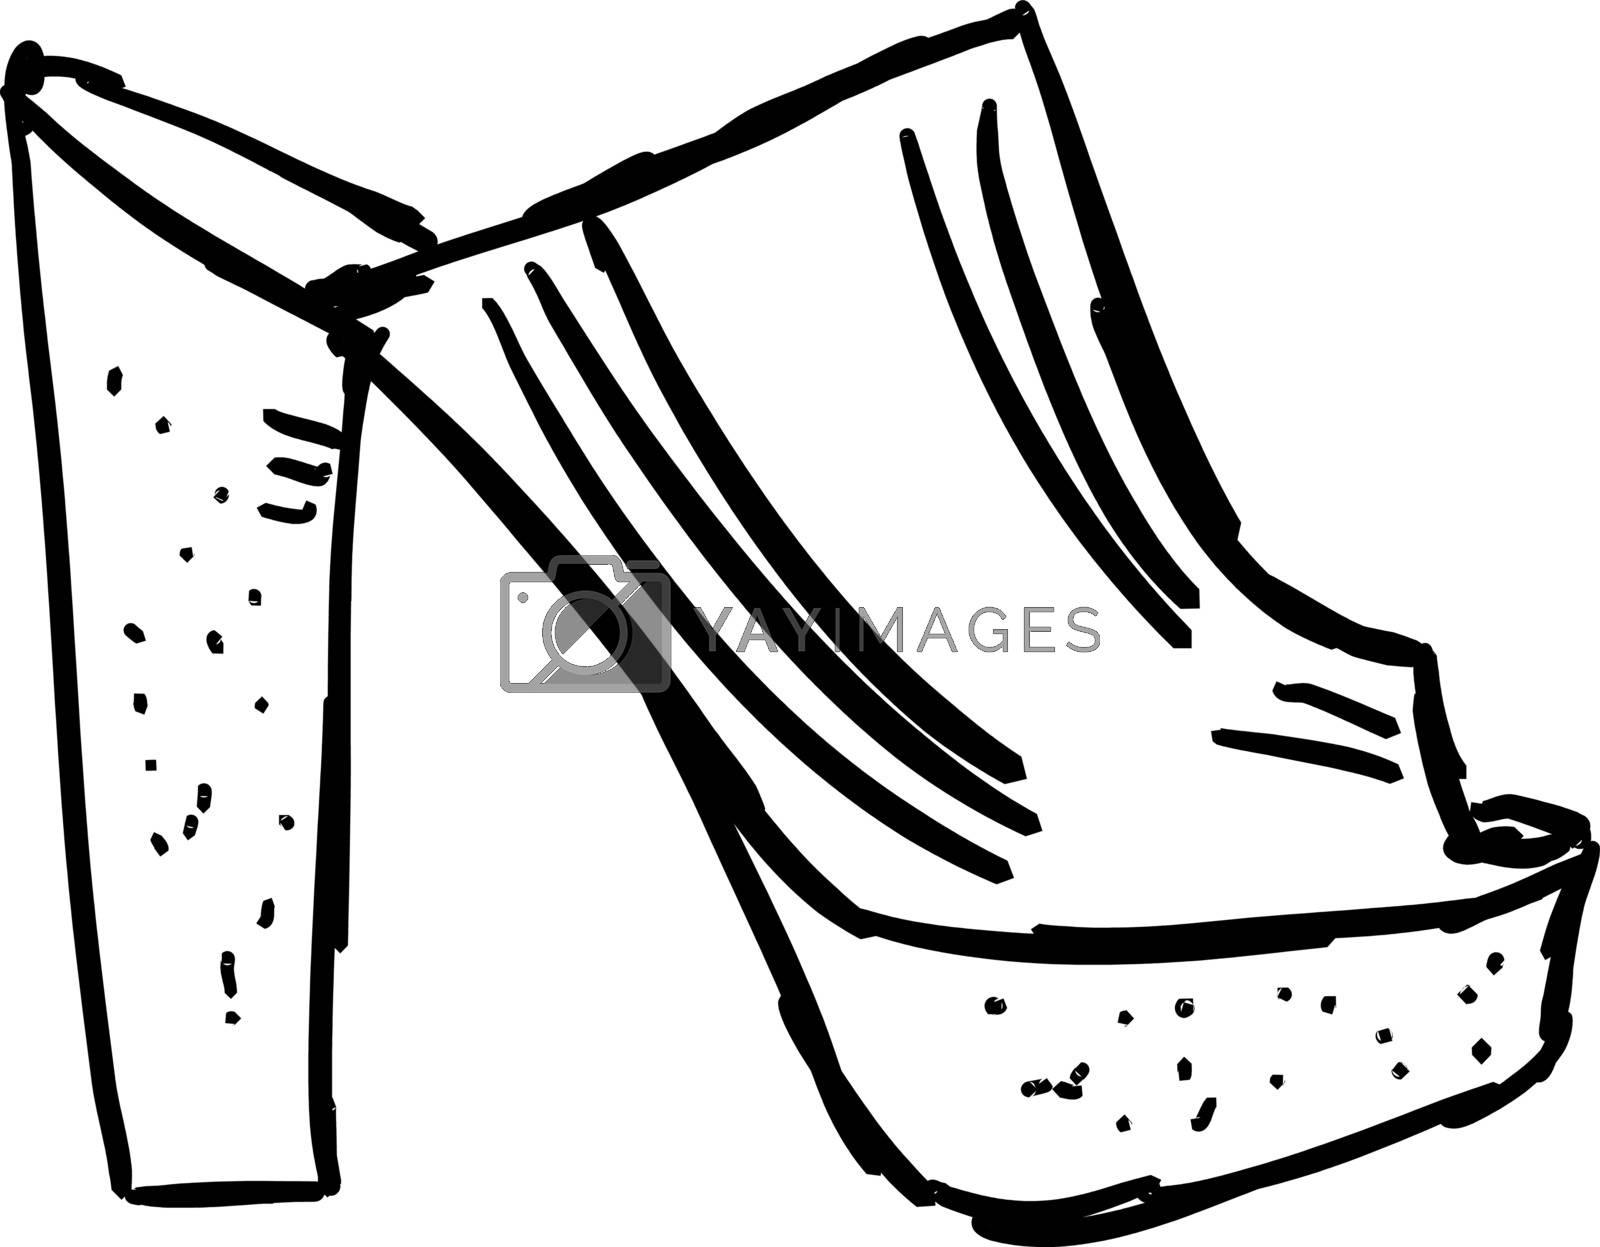 Girls shoes, illustration, vector on white background.